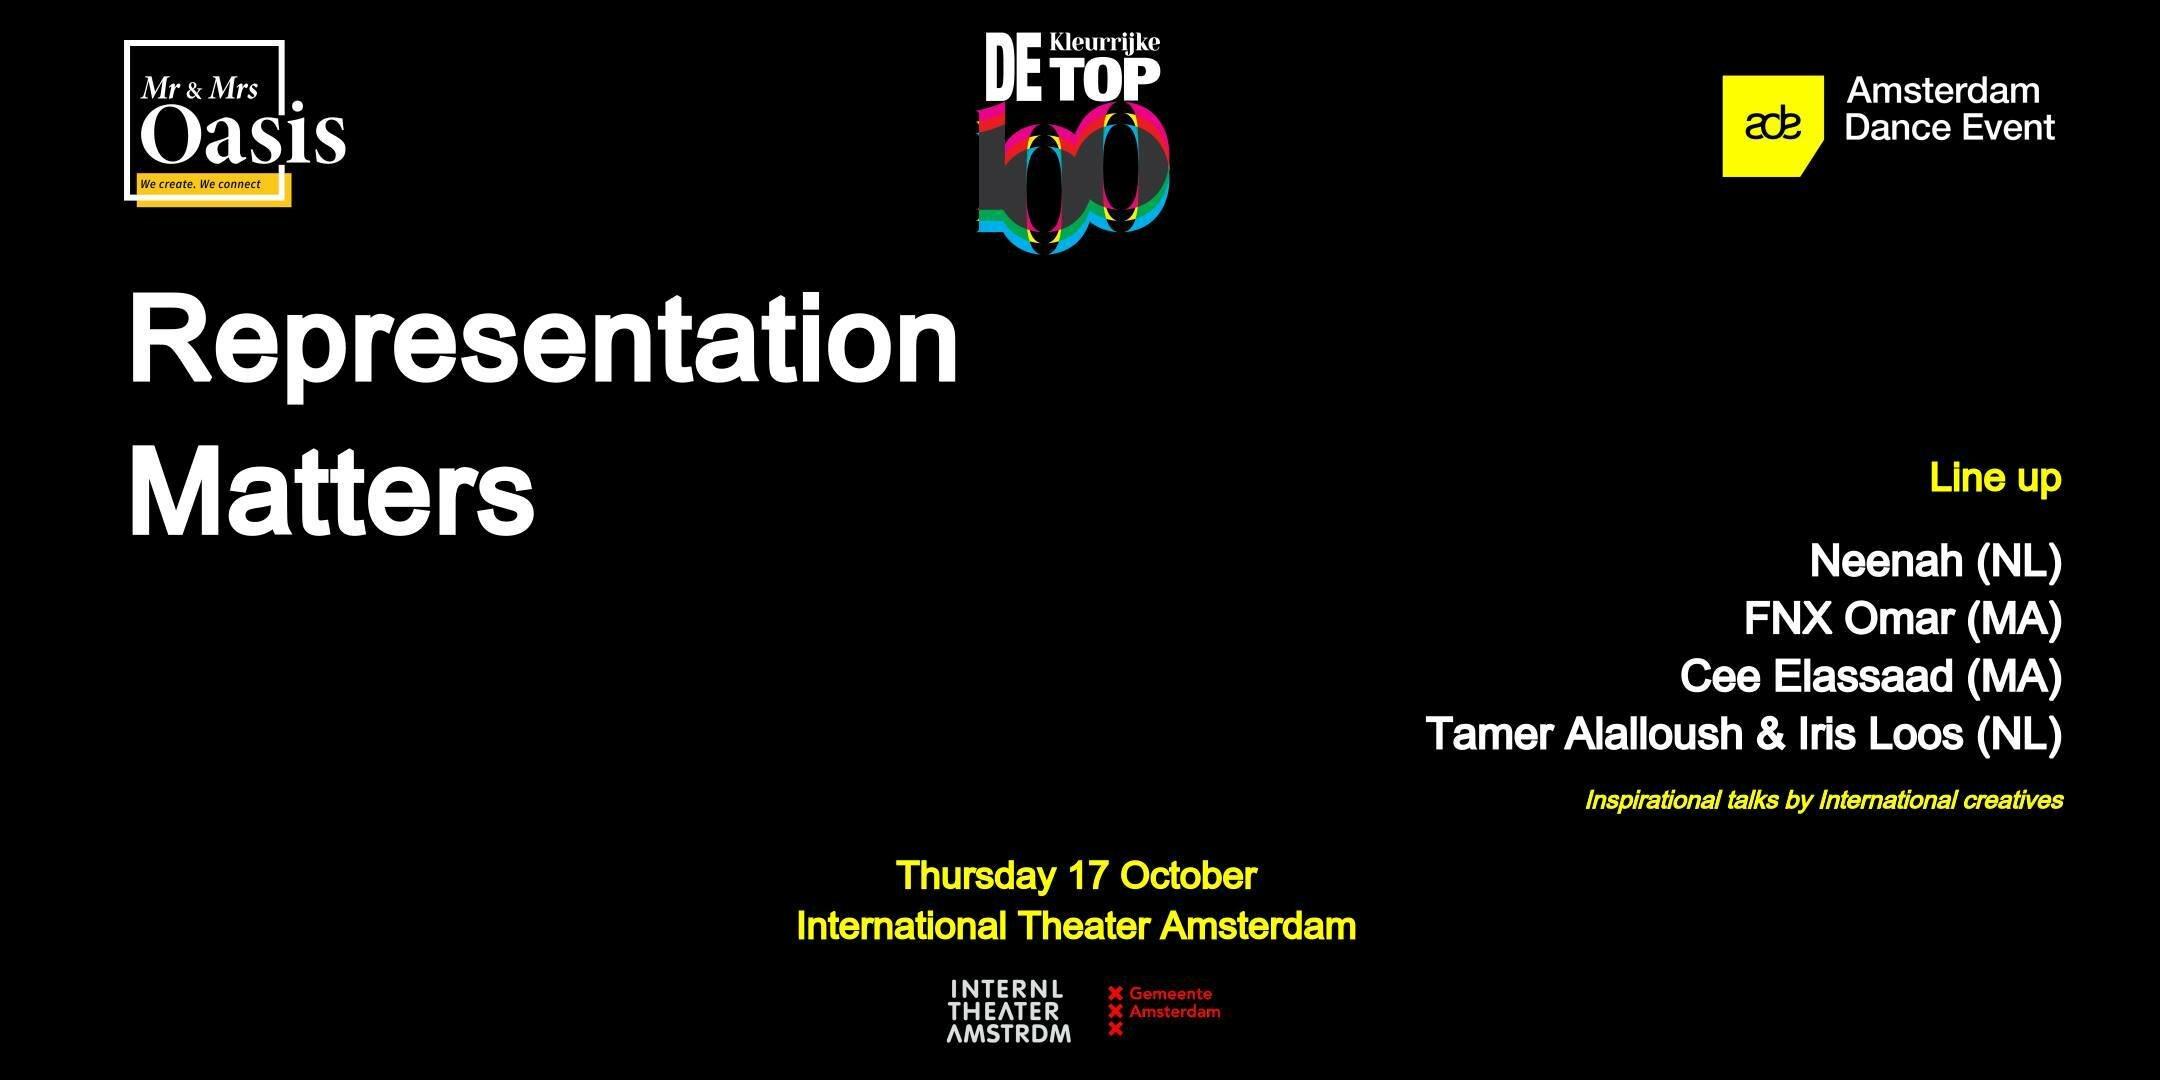 ADE x Kleurrijke Salon: Representation Matters